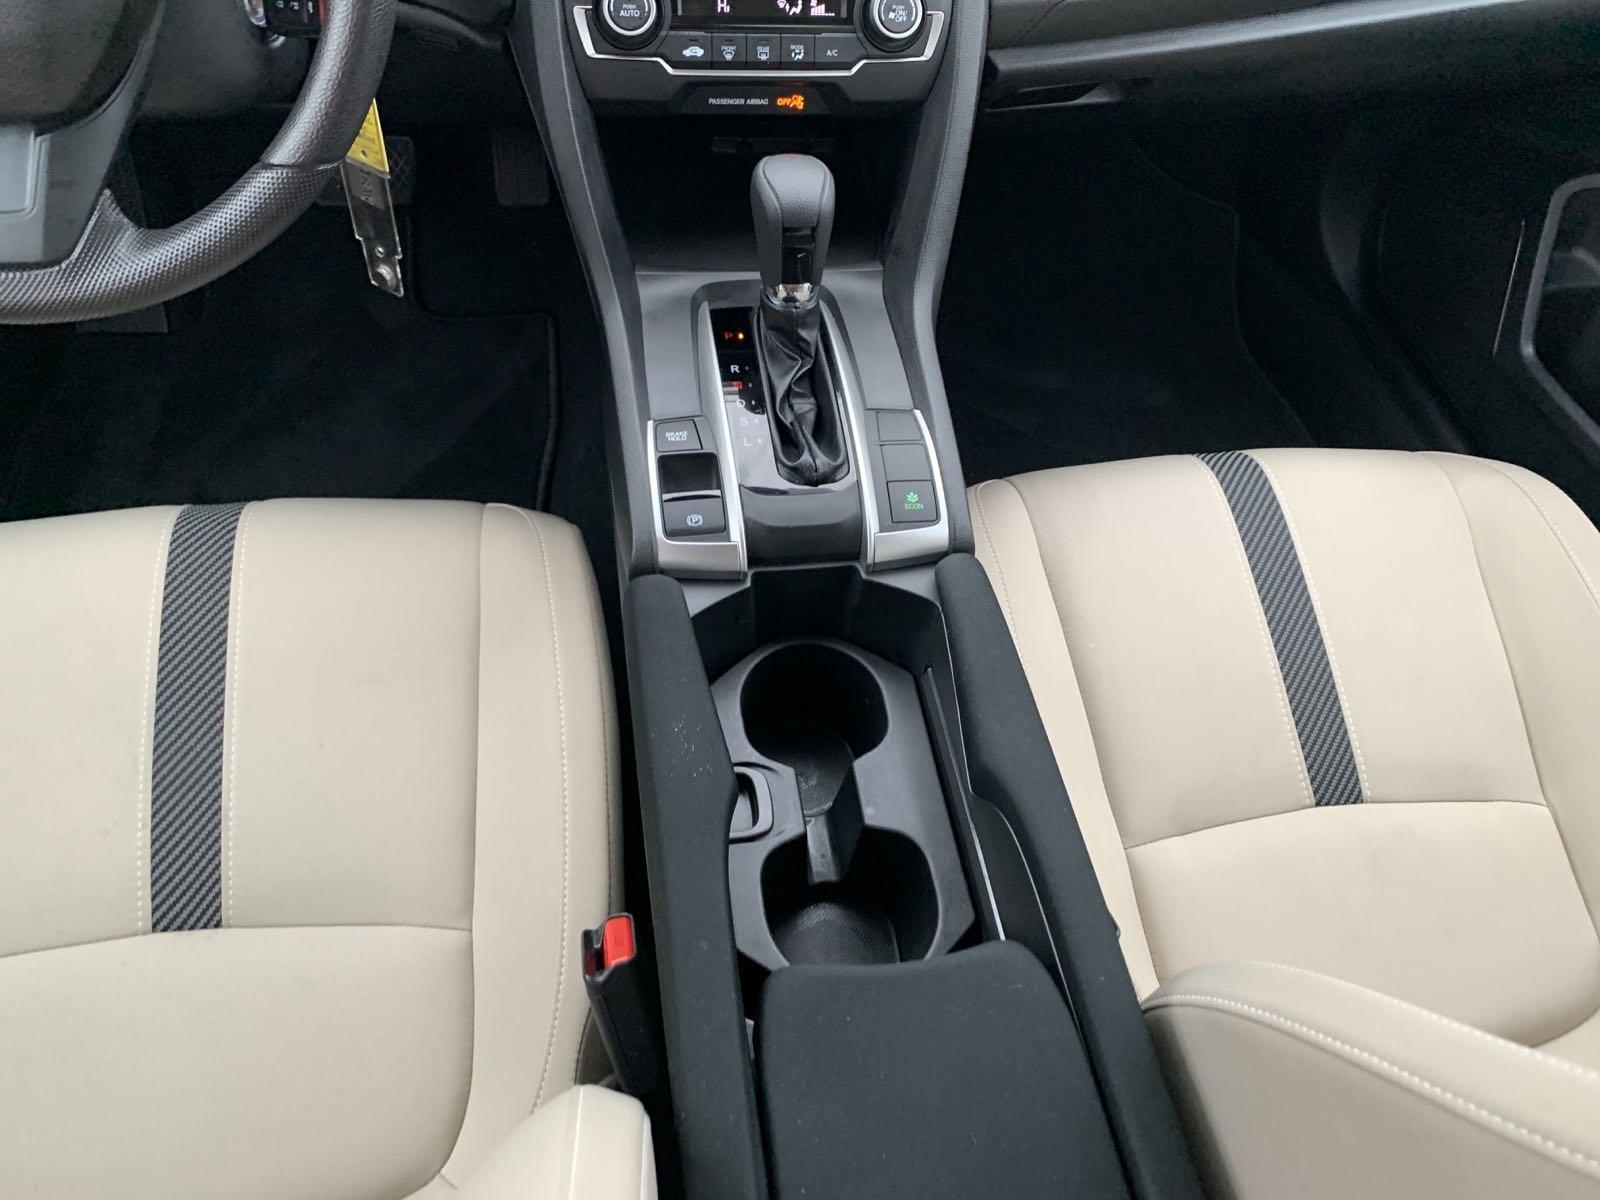 Pre-Owned 2018 Honda Civic LX